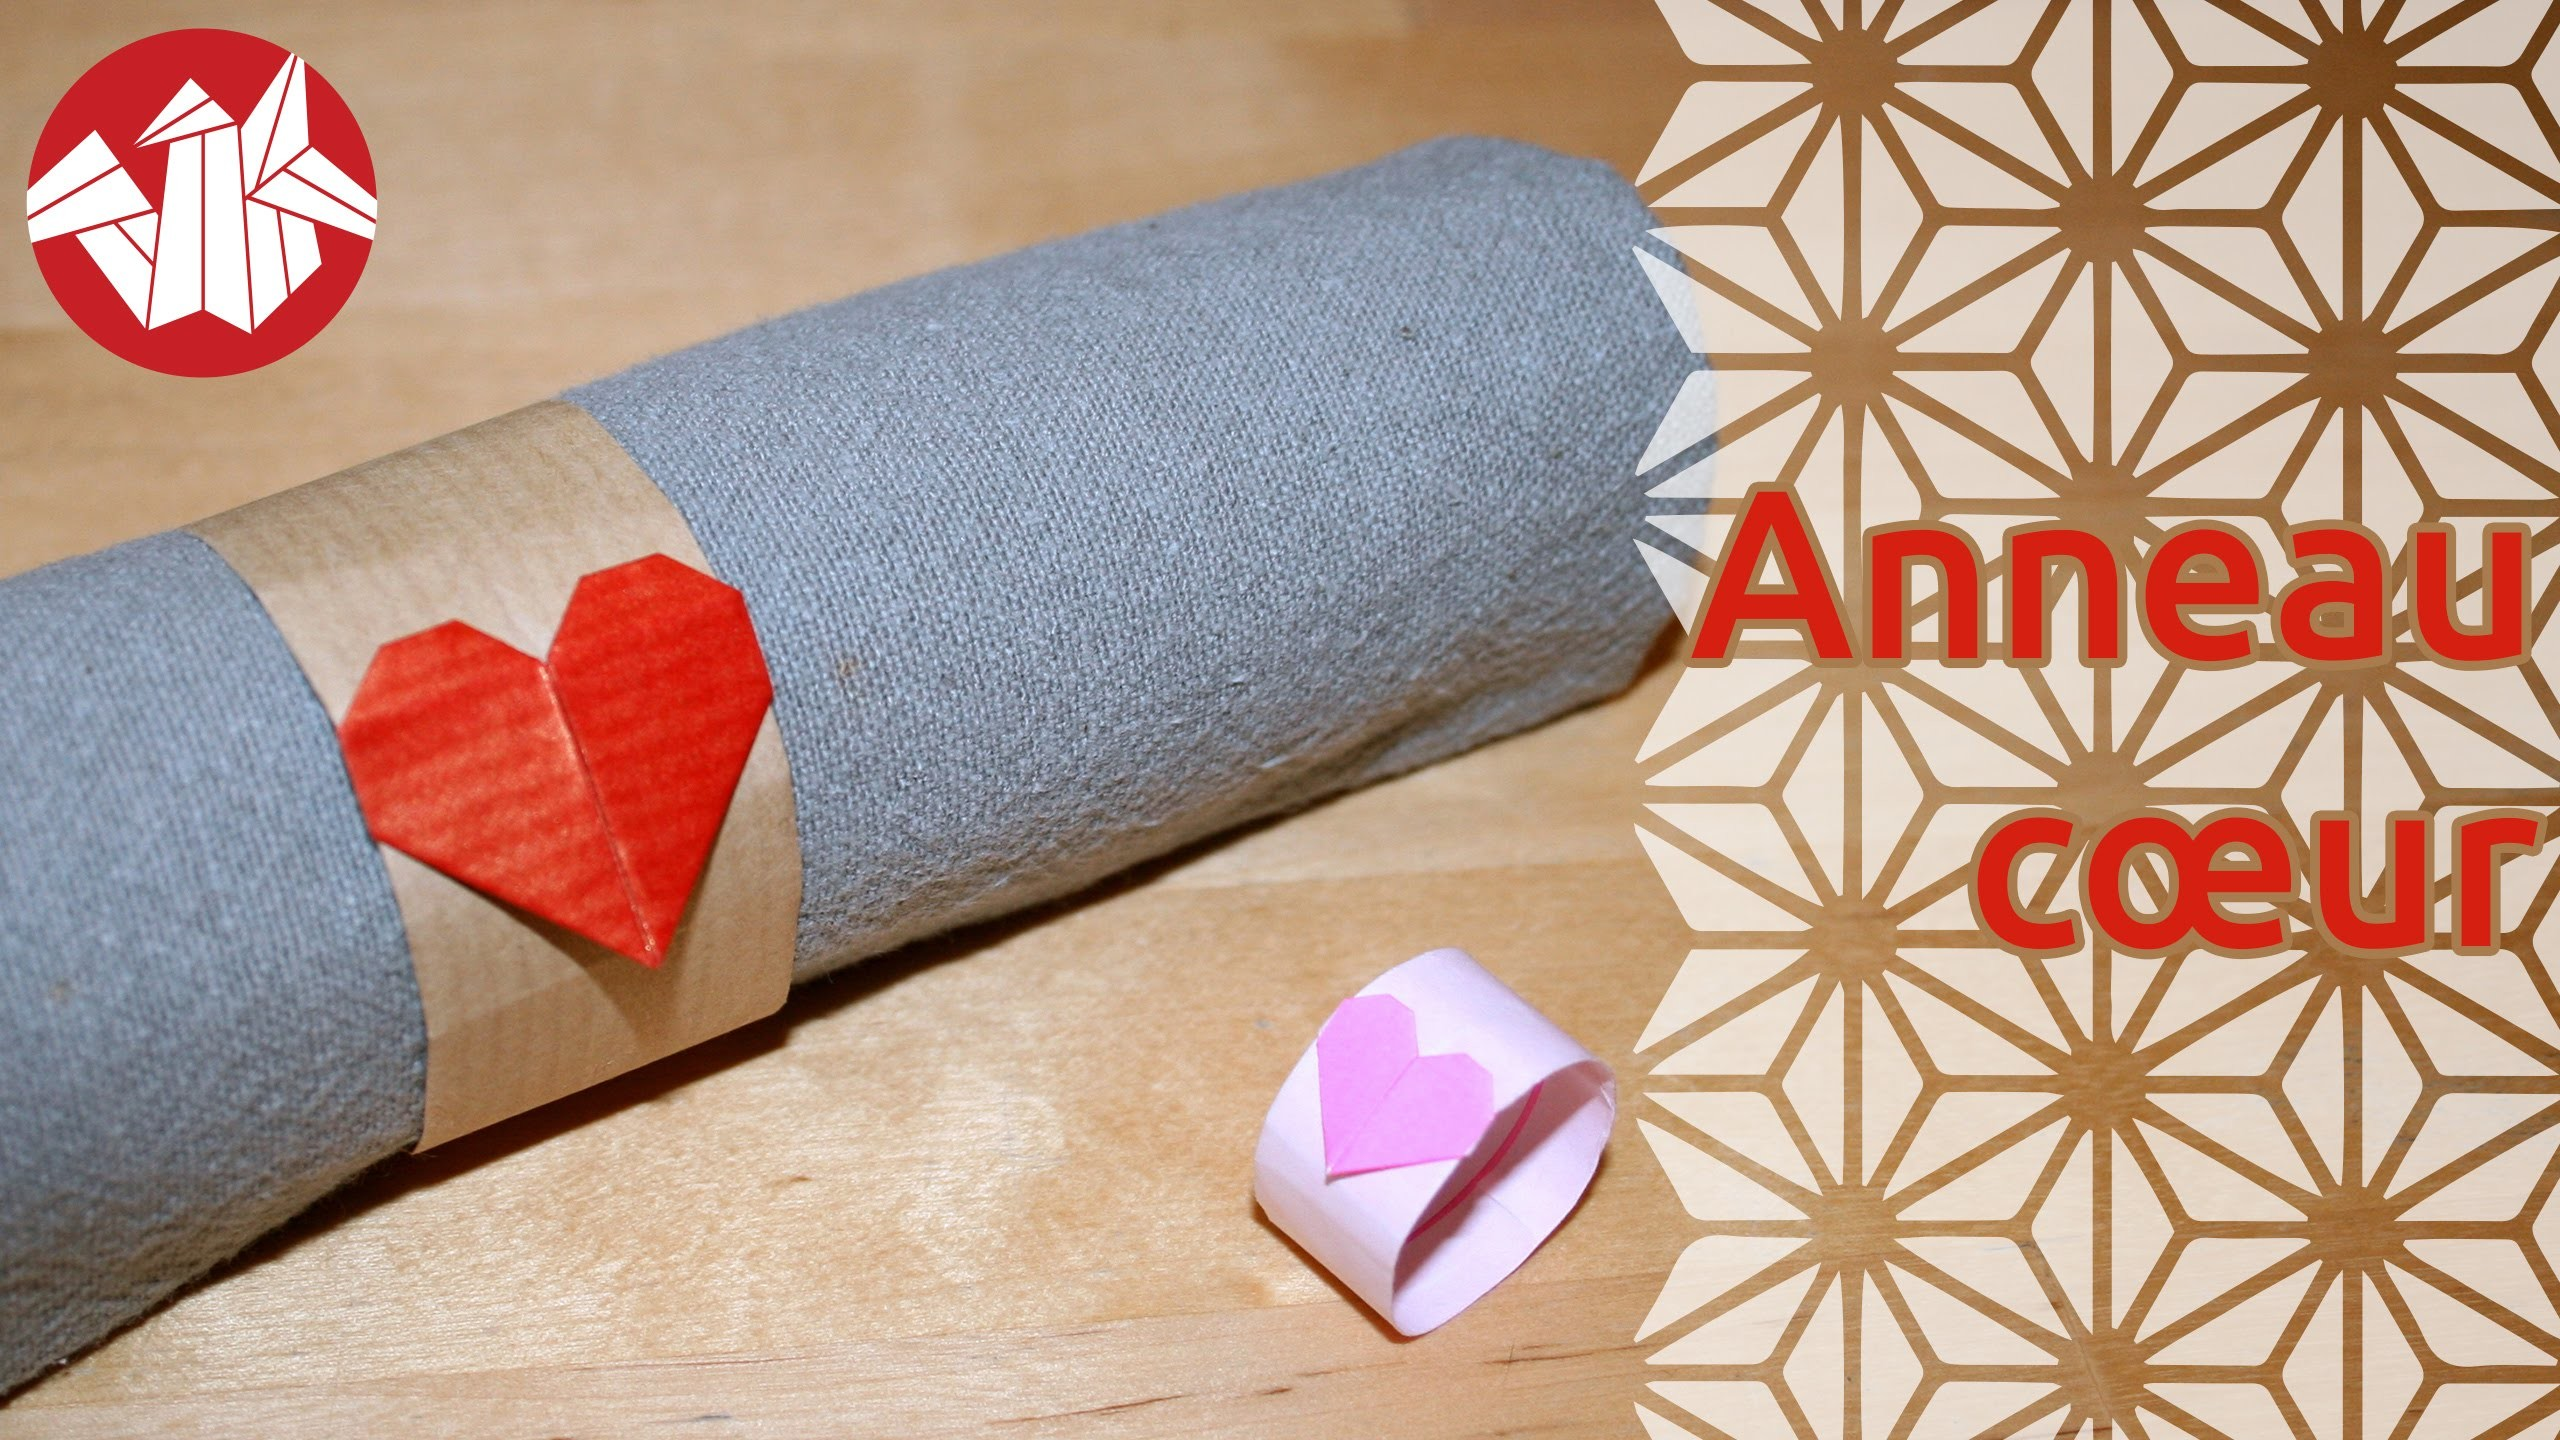 Origami - Anneau coeur - Heart Ring [Senbazuru]